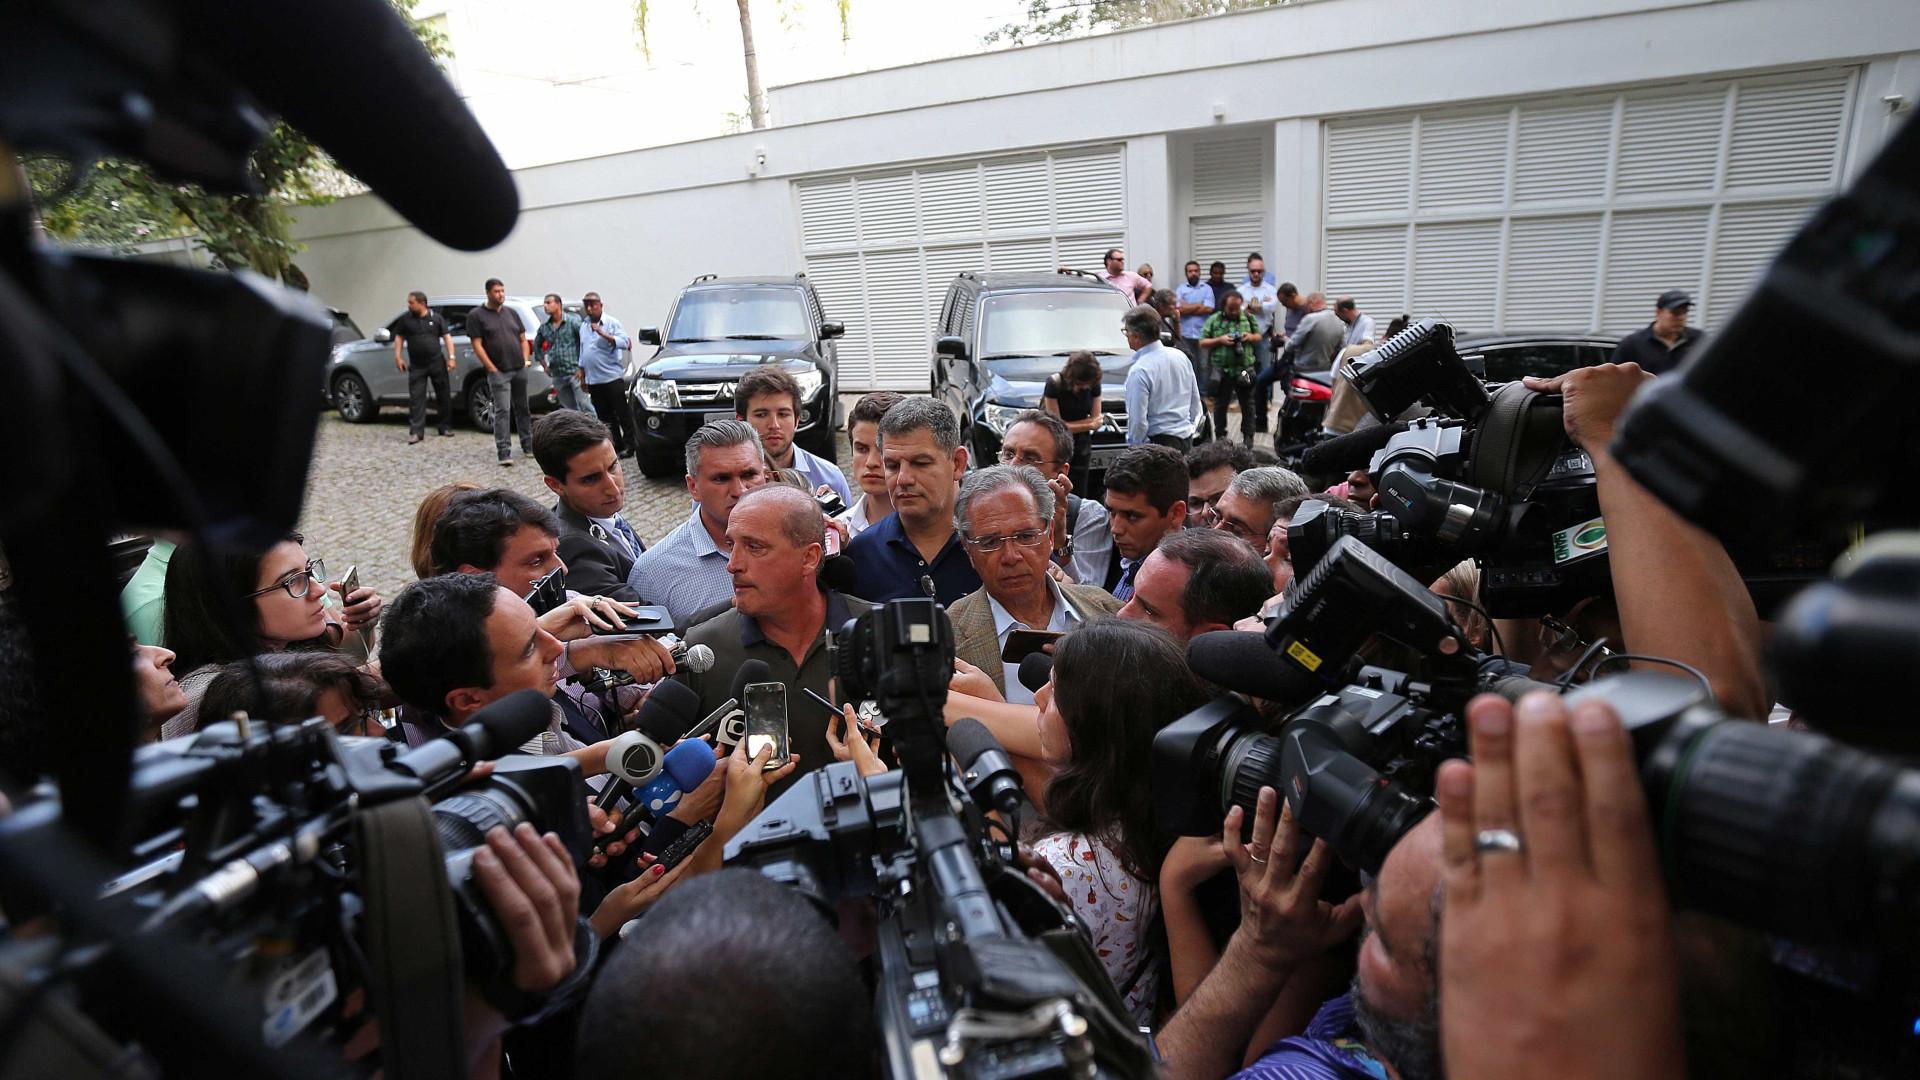 General desiste de ministério e leva crise ao QG de Bolsonaro